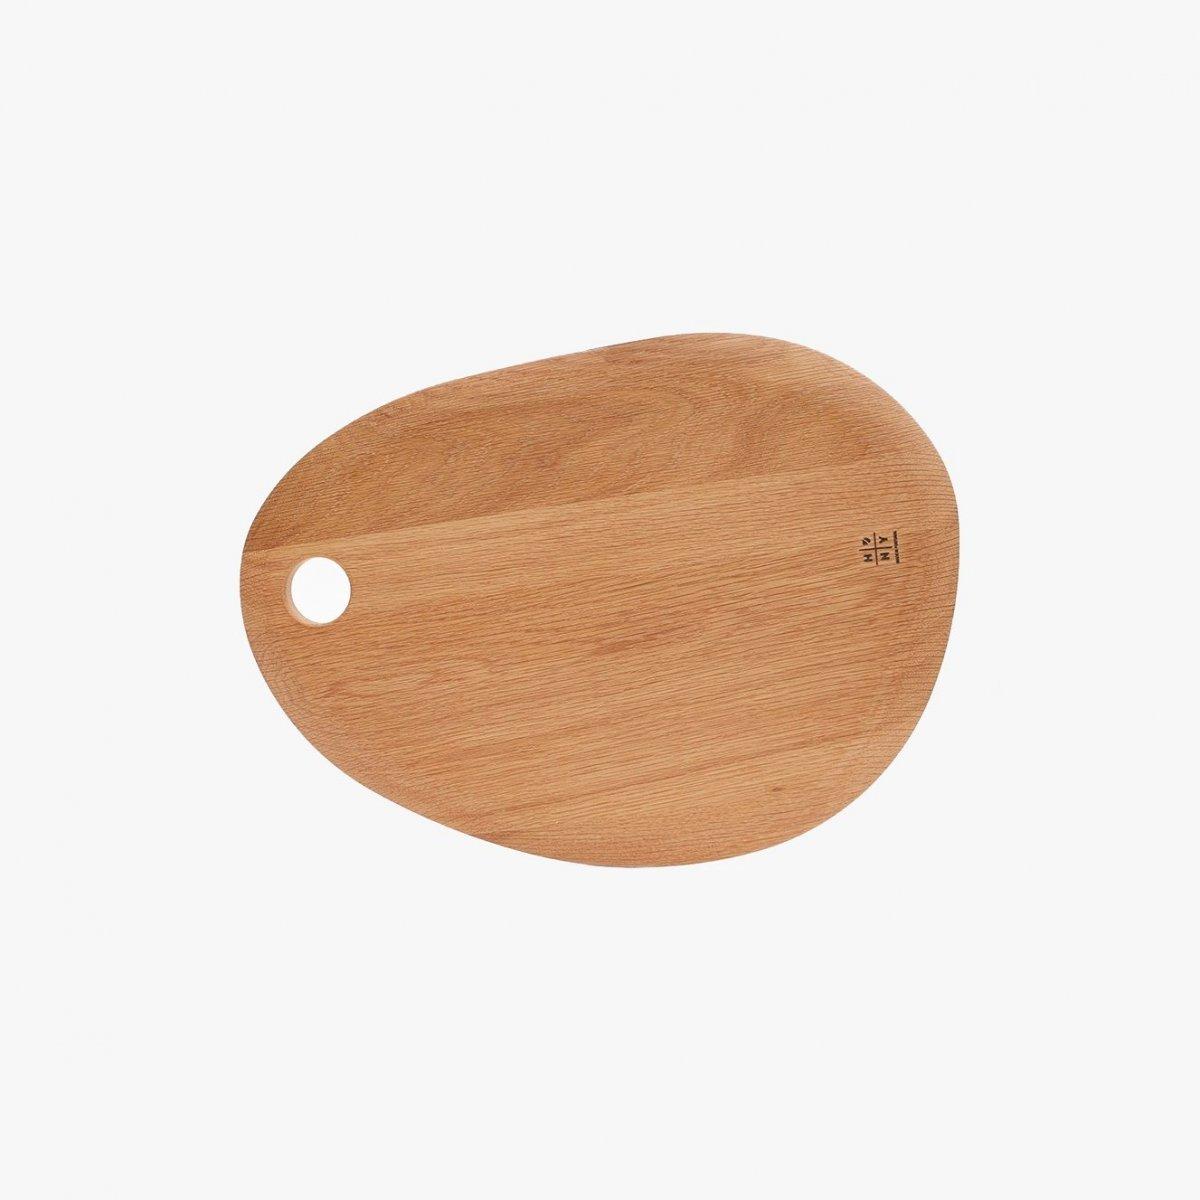 Simple Cutting Board, large.